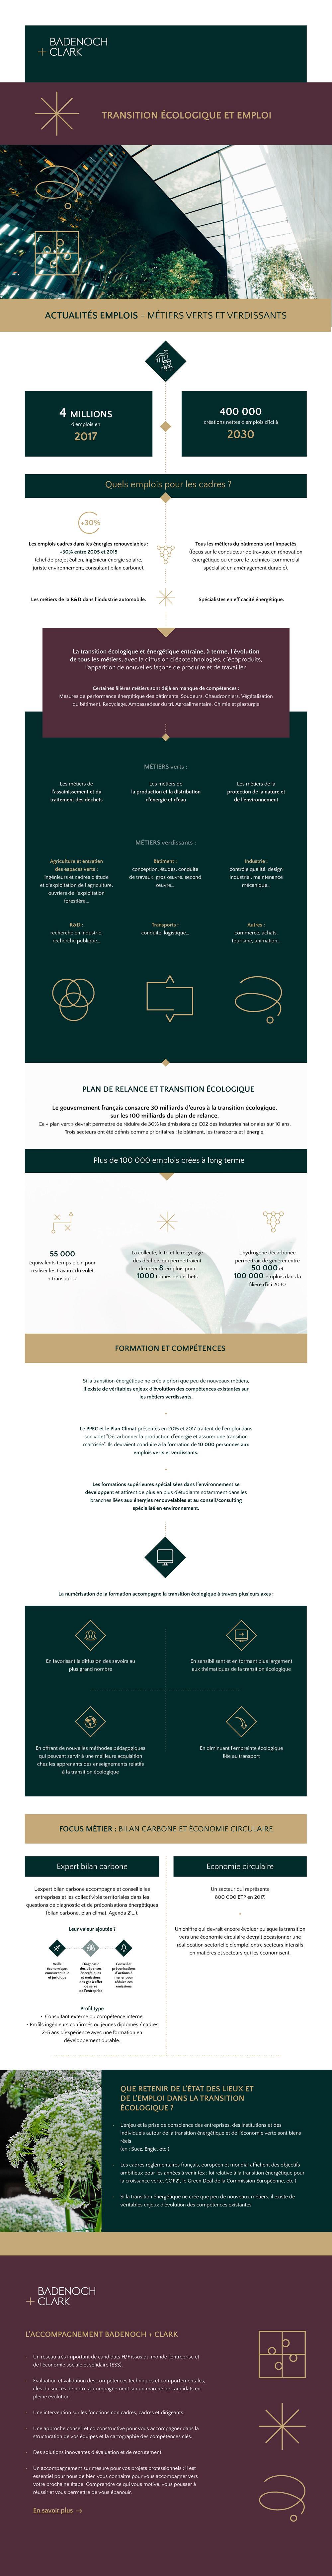 Infographie ecologie